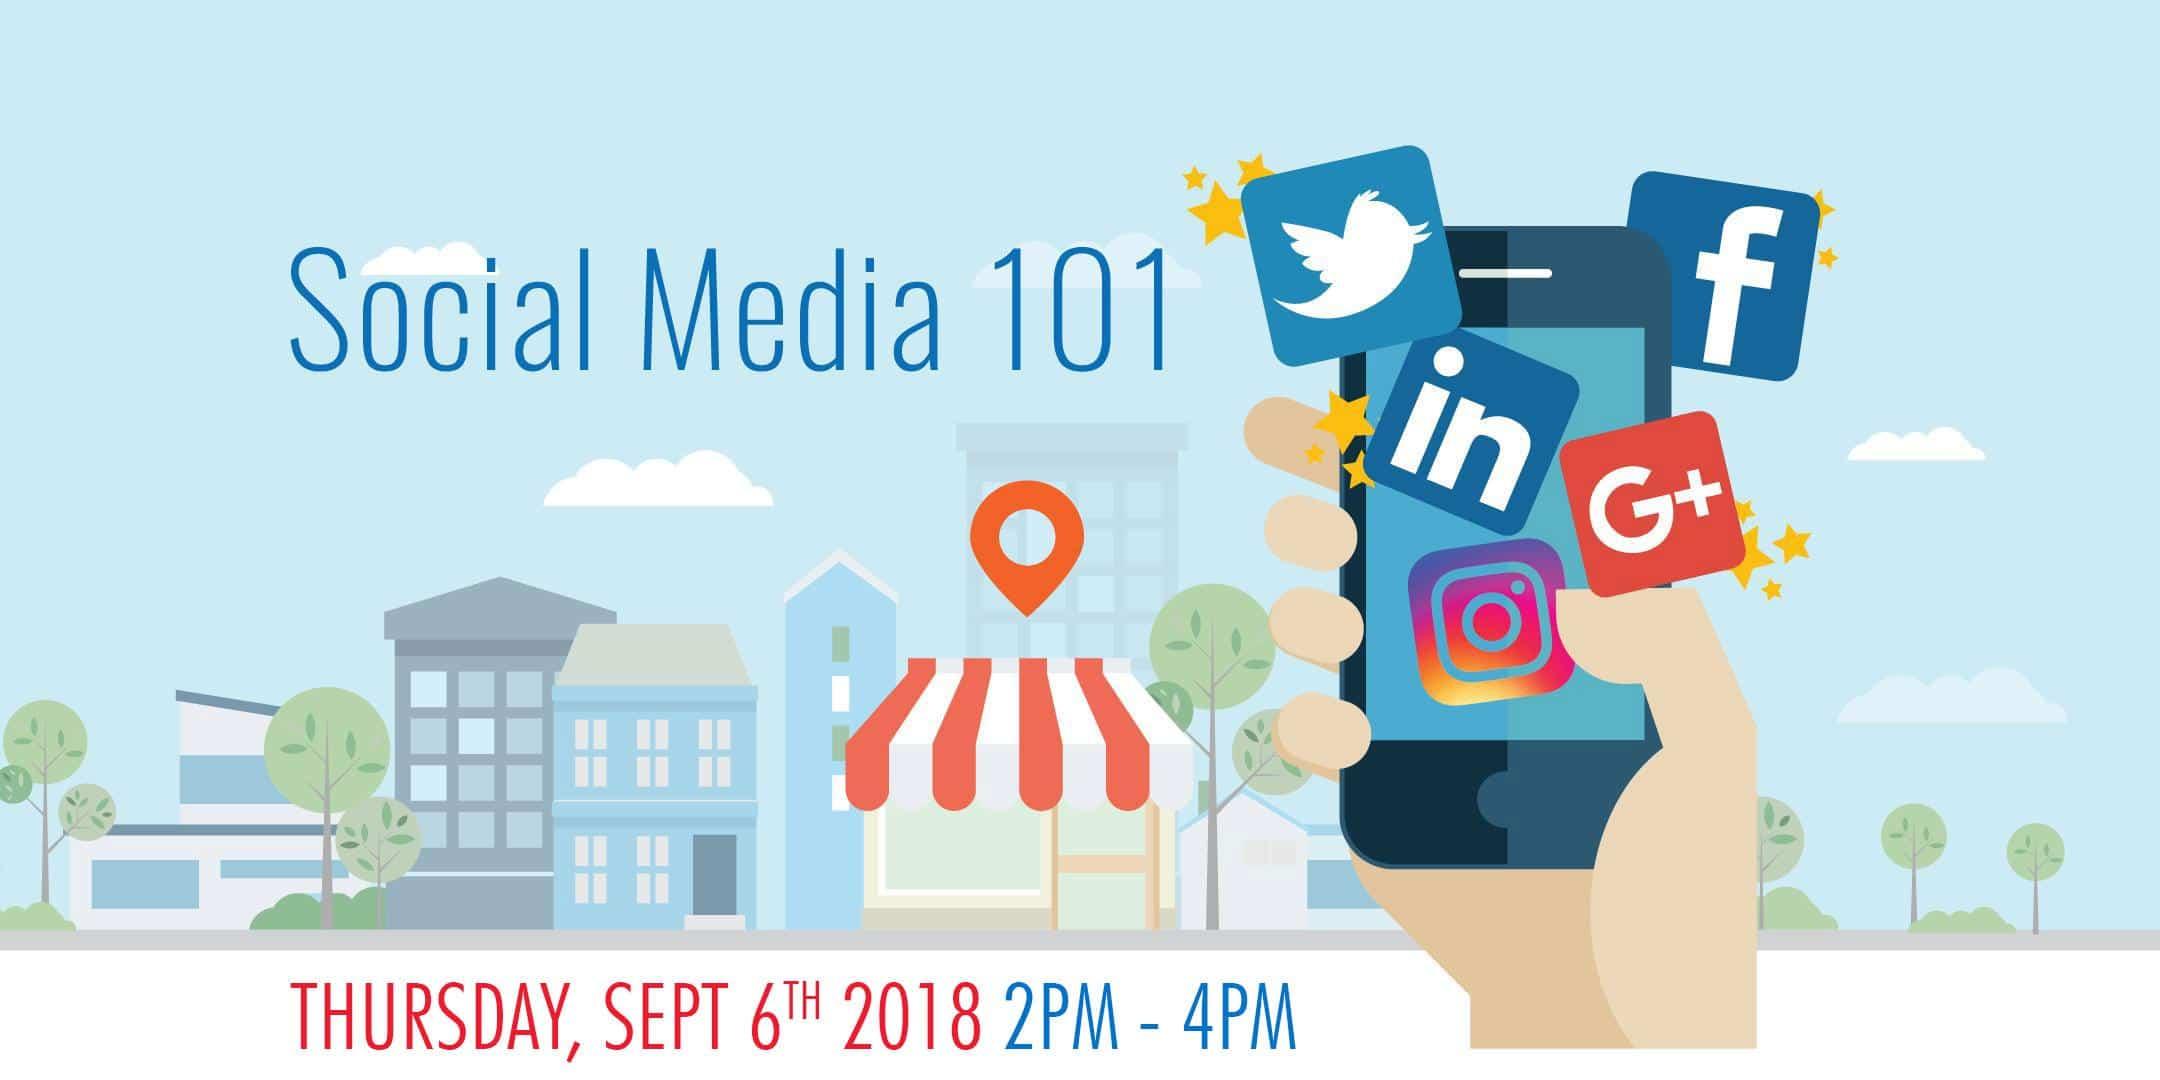 Social Media 101 thumbnail image